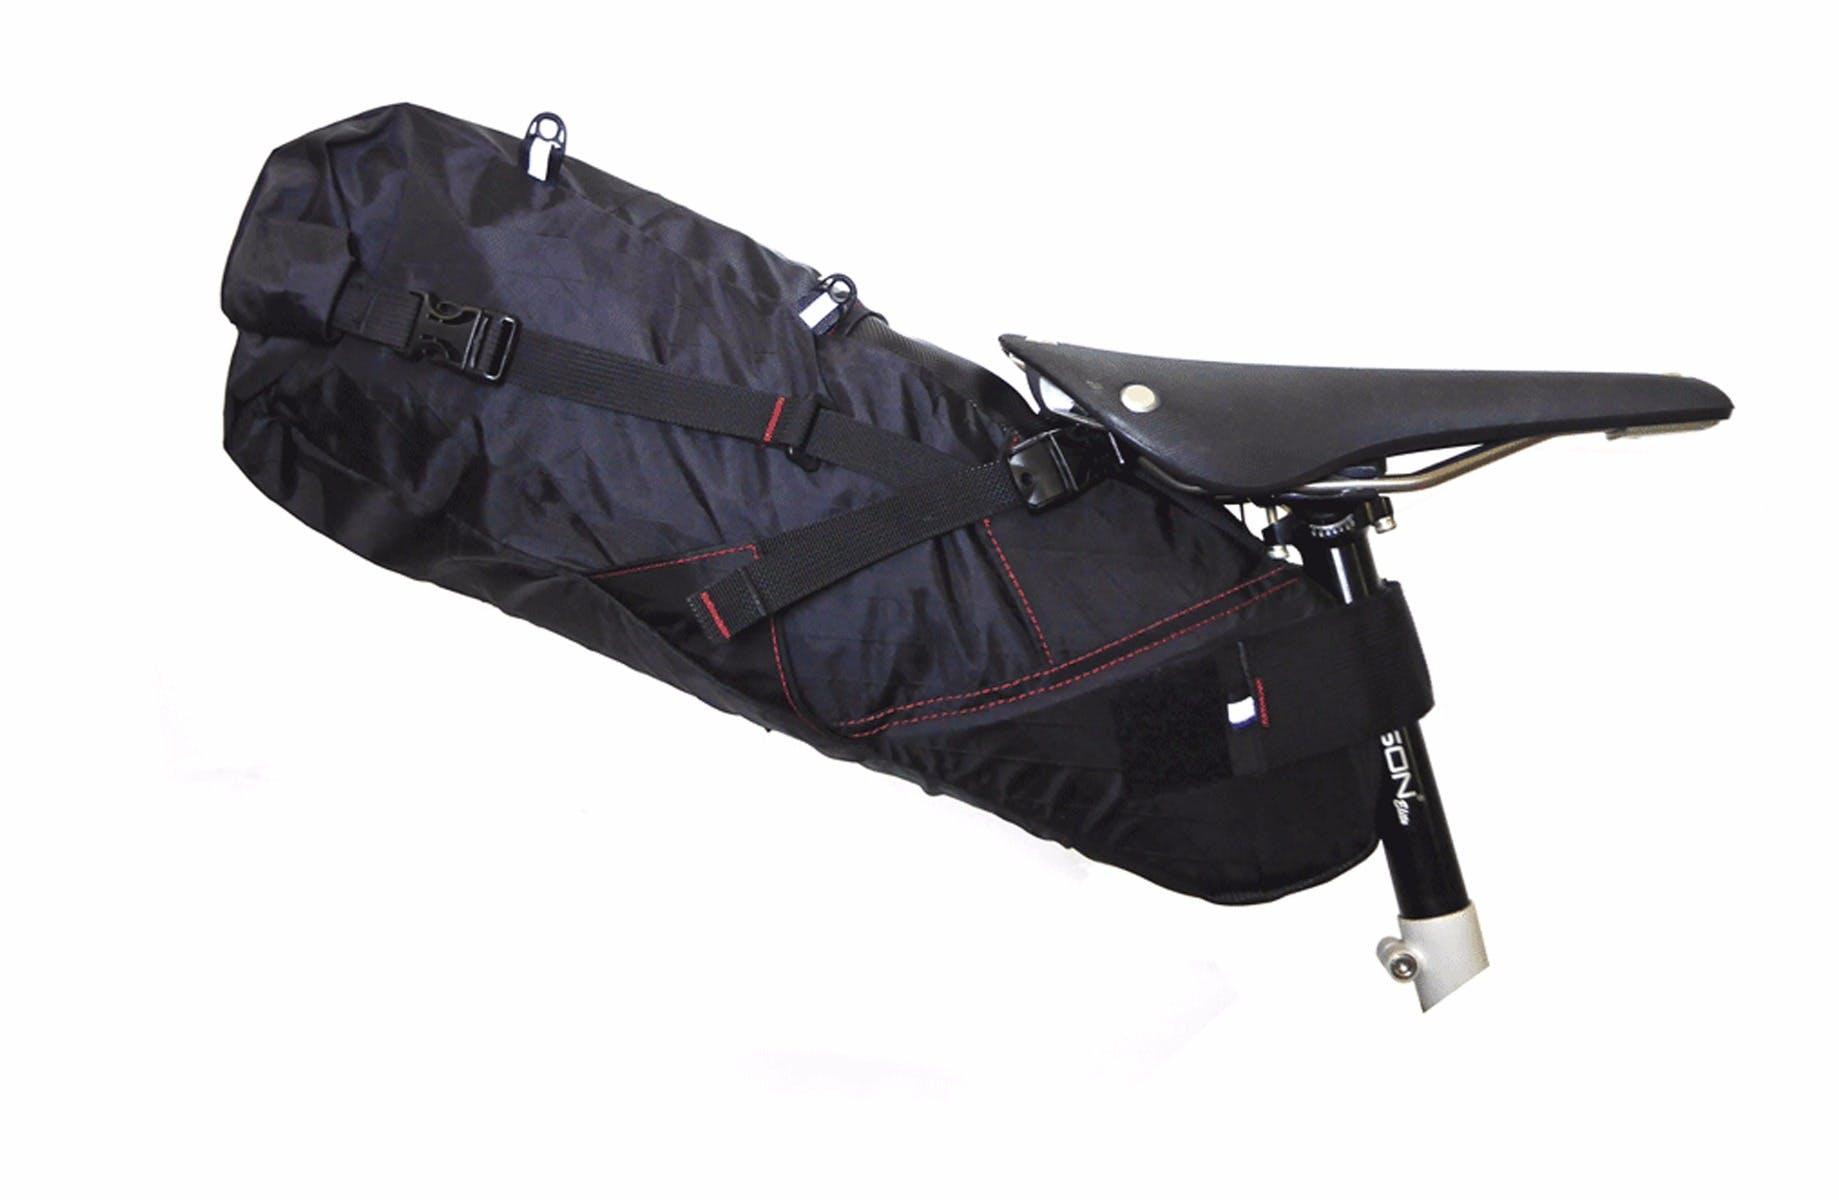 Pika Seat Pack | Revelate Designs – Pannier